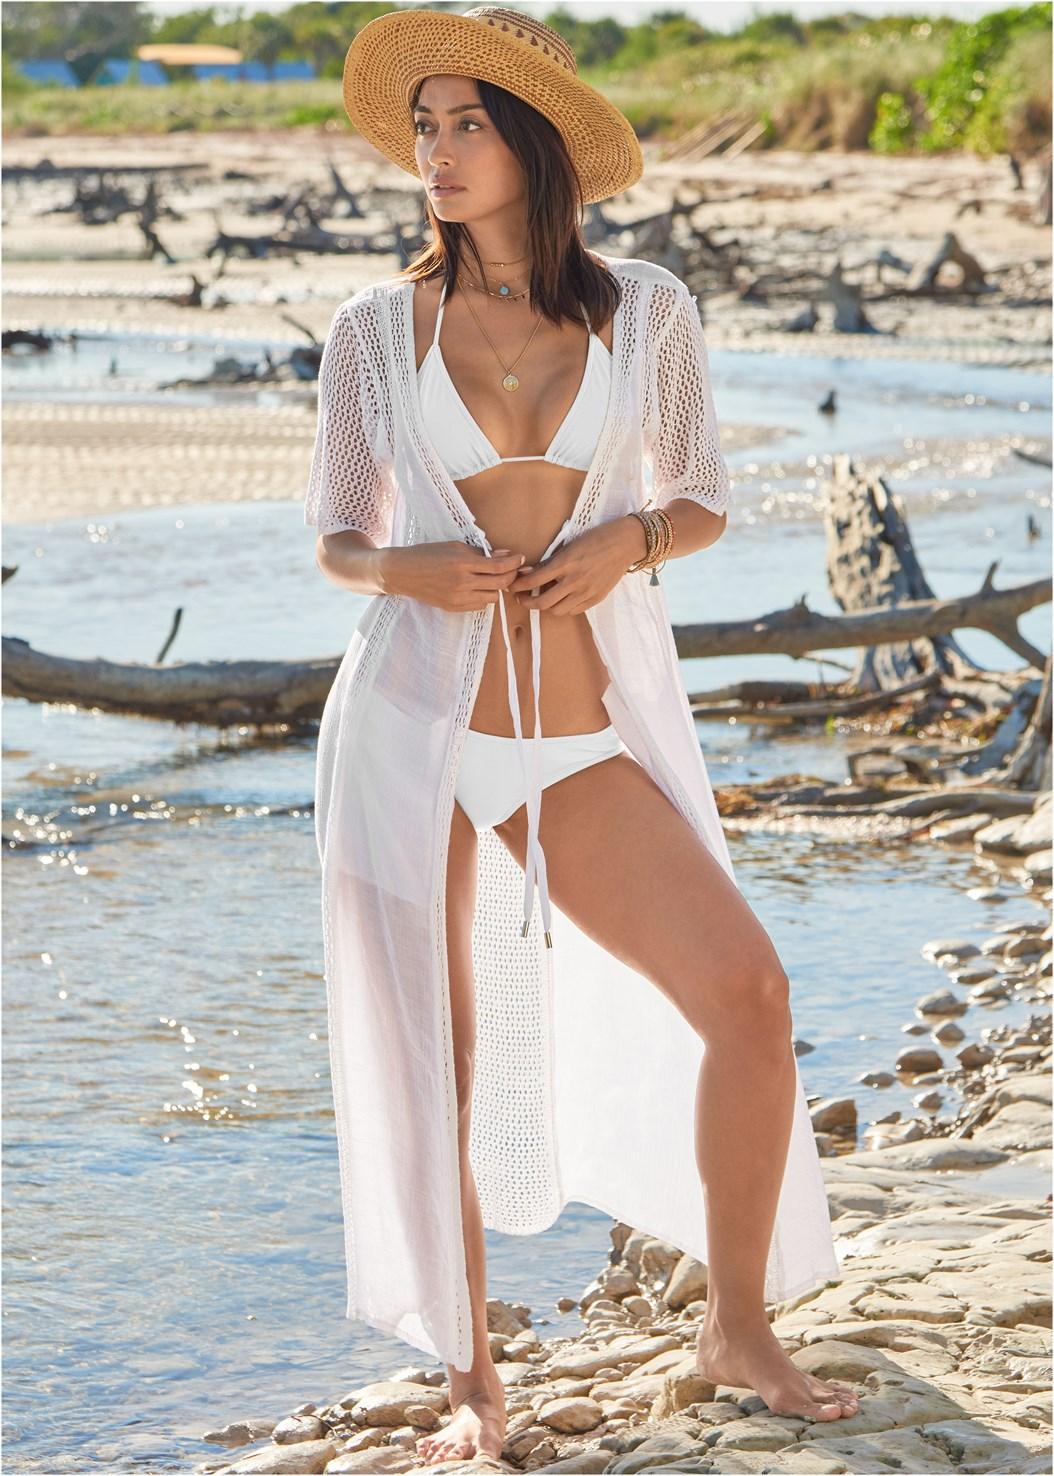 Crochet Duster,Triangle String Bikini Top,Scoop Front Classic Bikini Bottom ,Slimming Bandeau One-Piece,Shell Detail Sandals